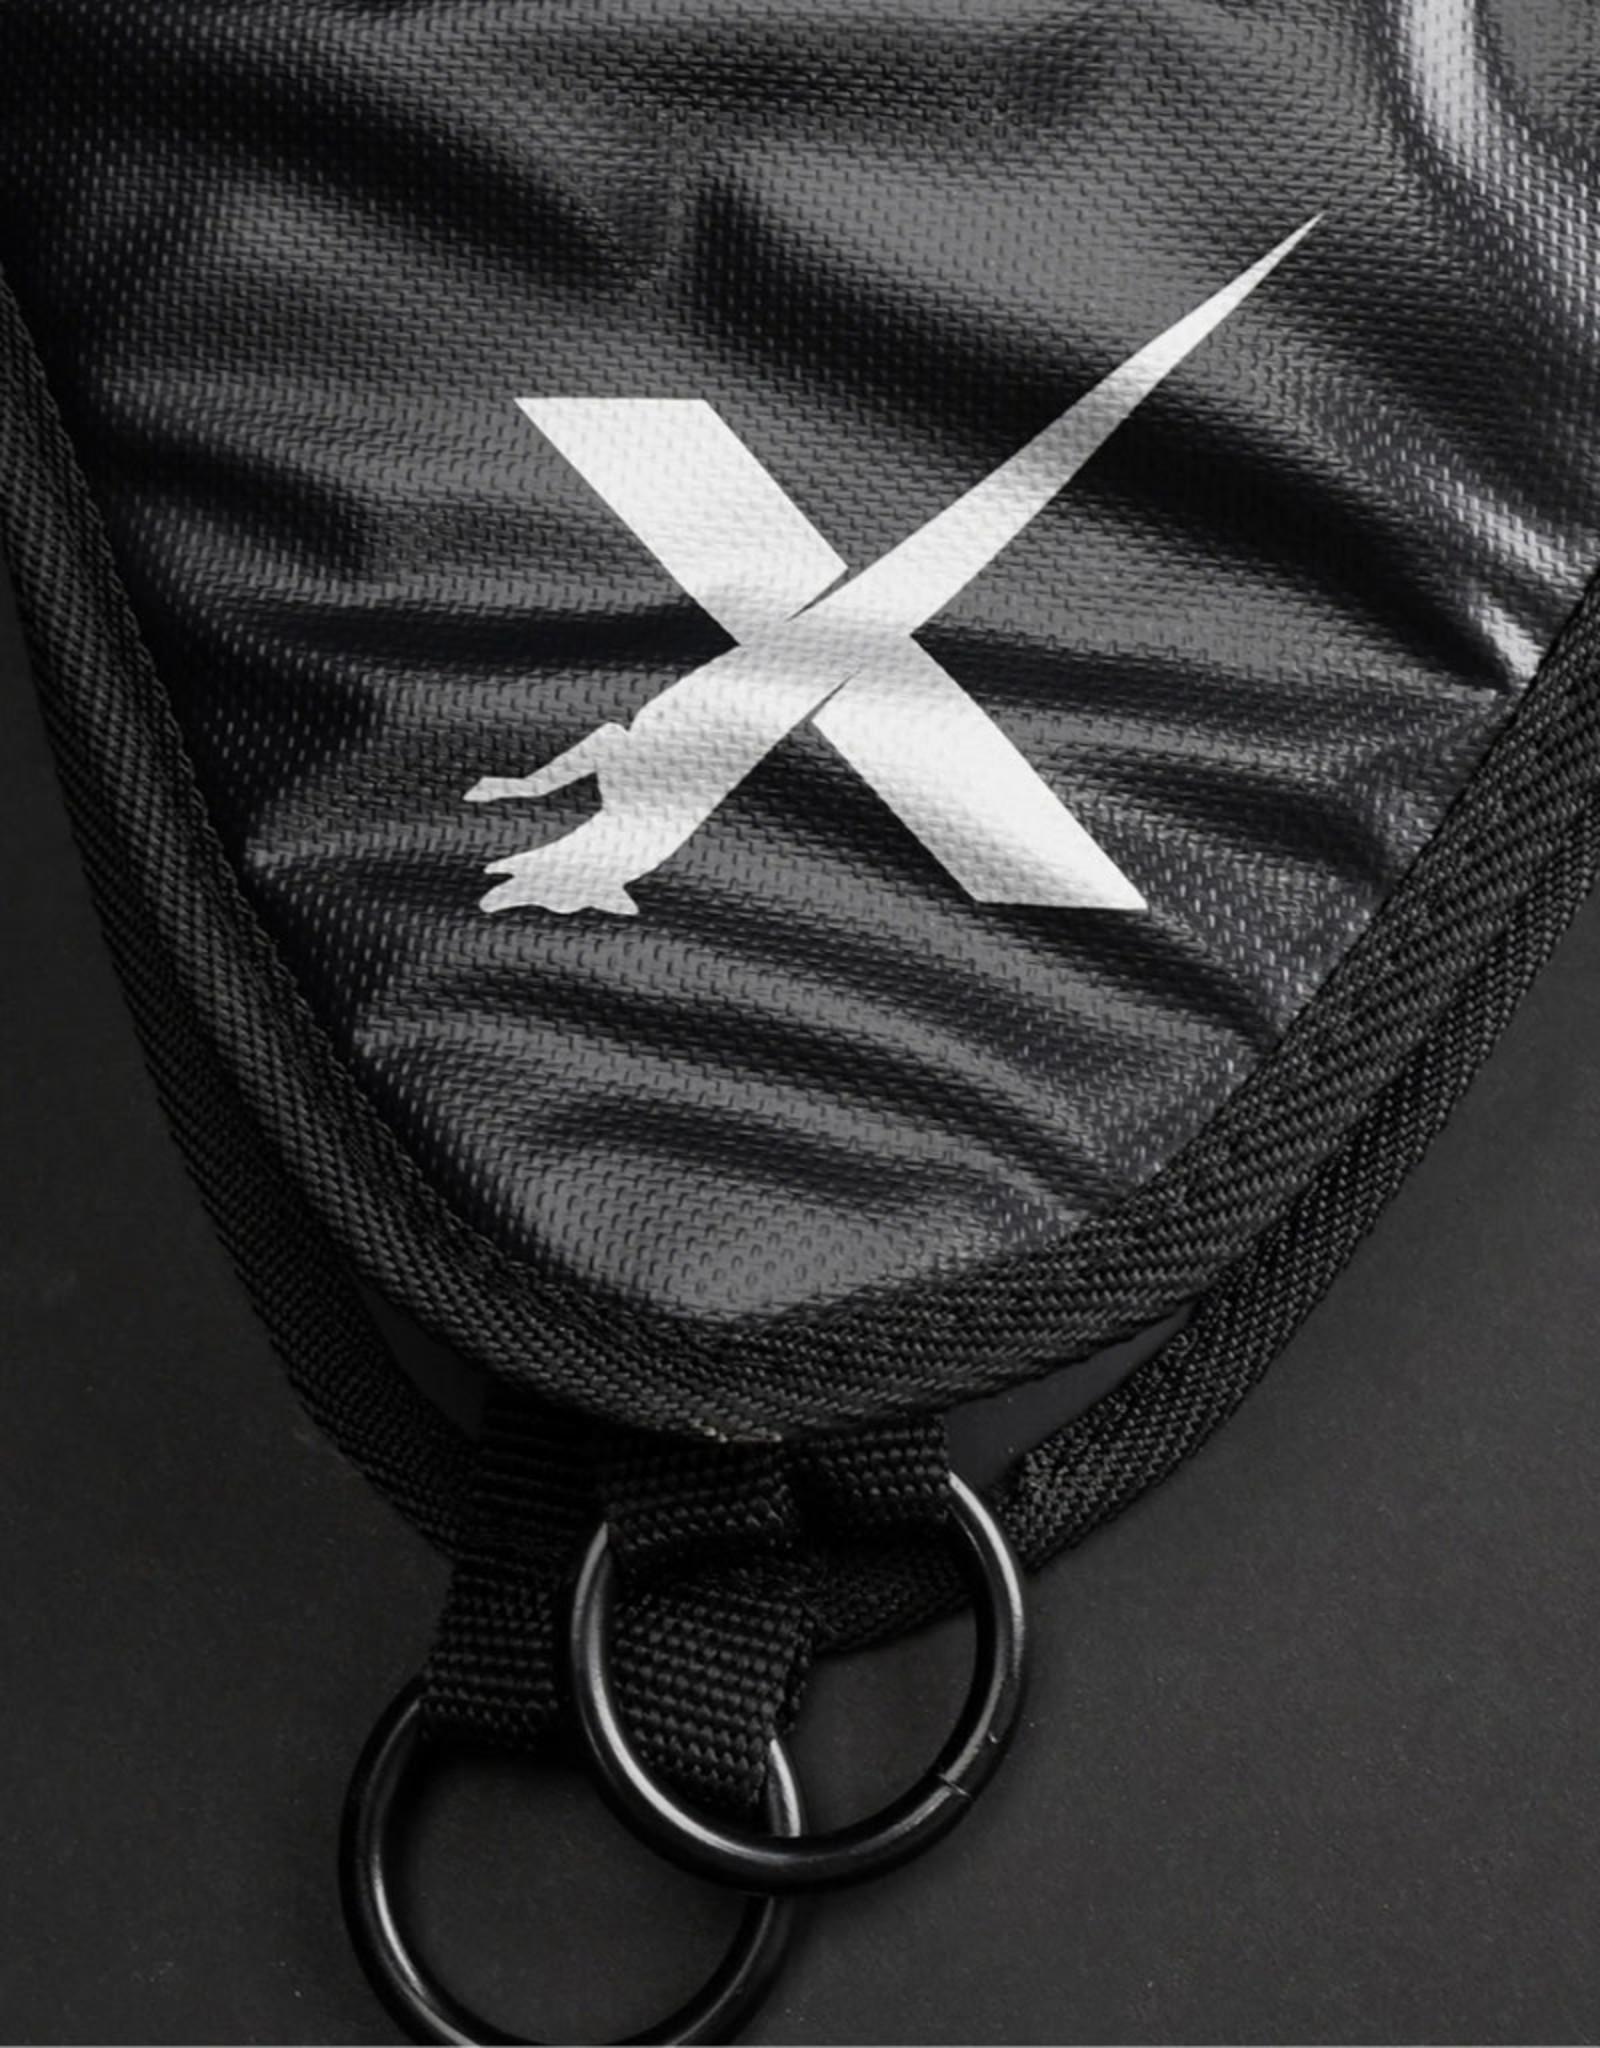 XDOG™ XDOG™ Weighted Drag Bag